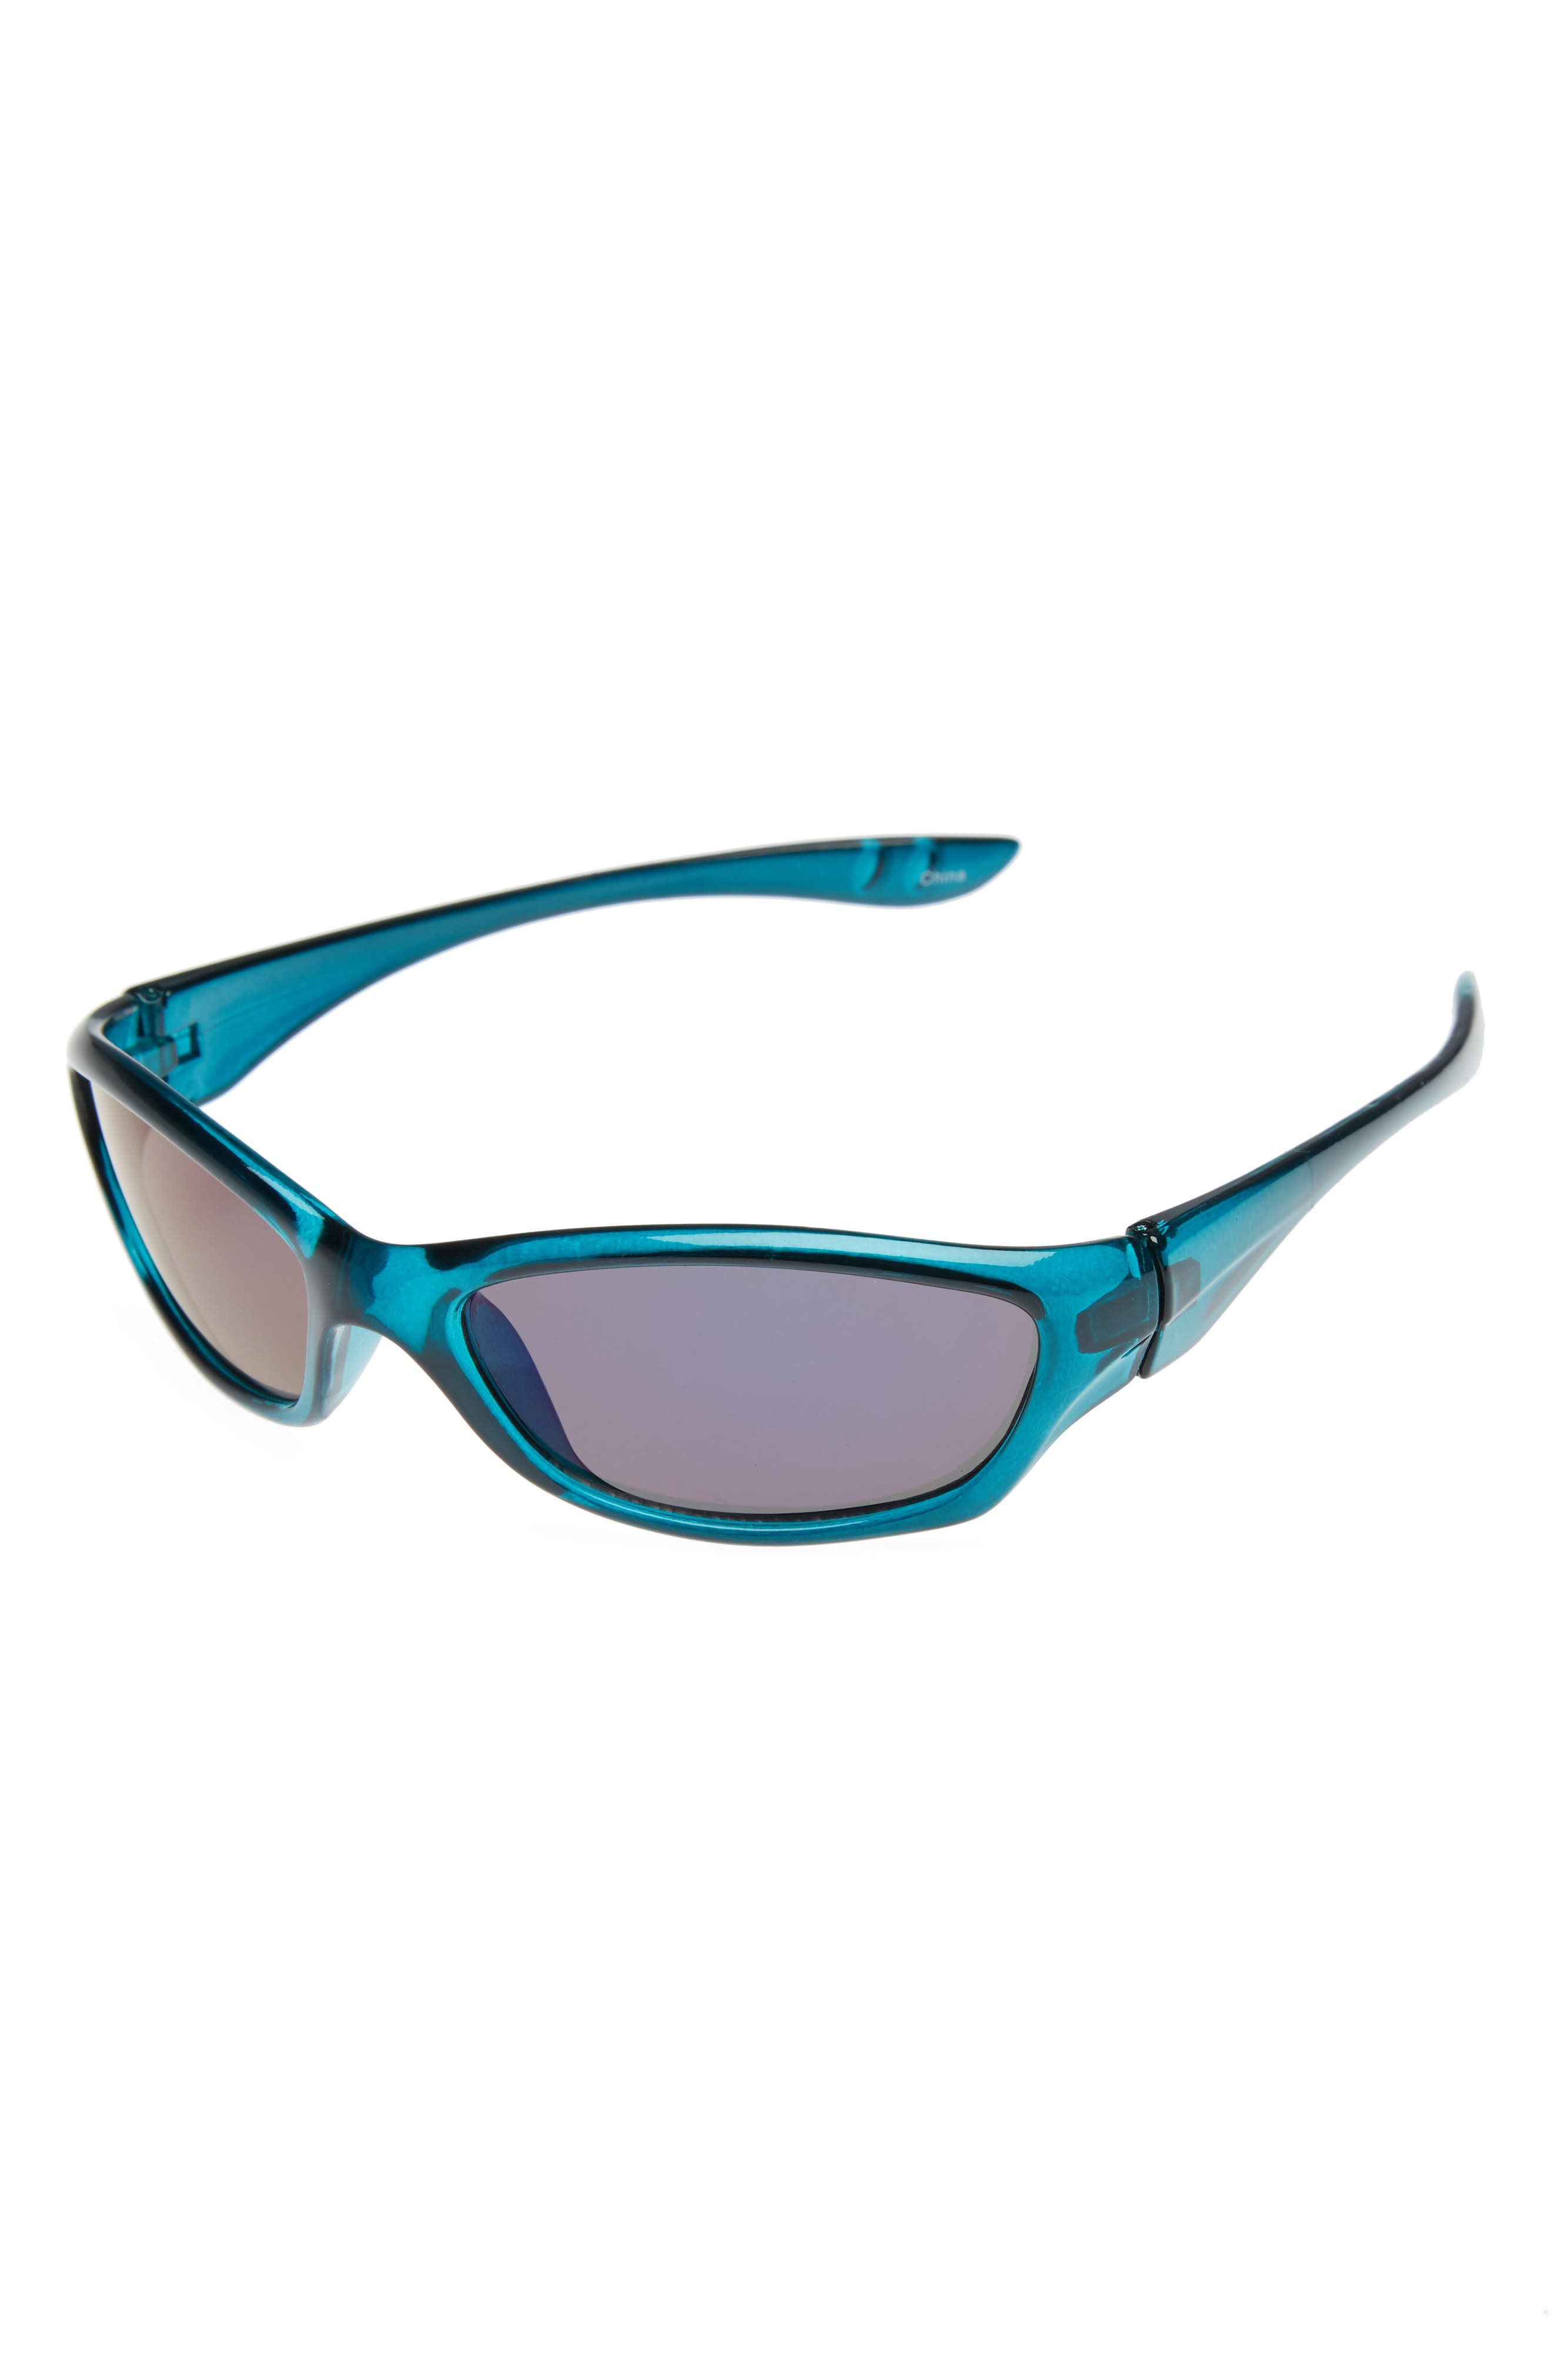 Icon Eyewear Wraparound Sunglasses (Boys)